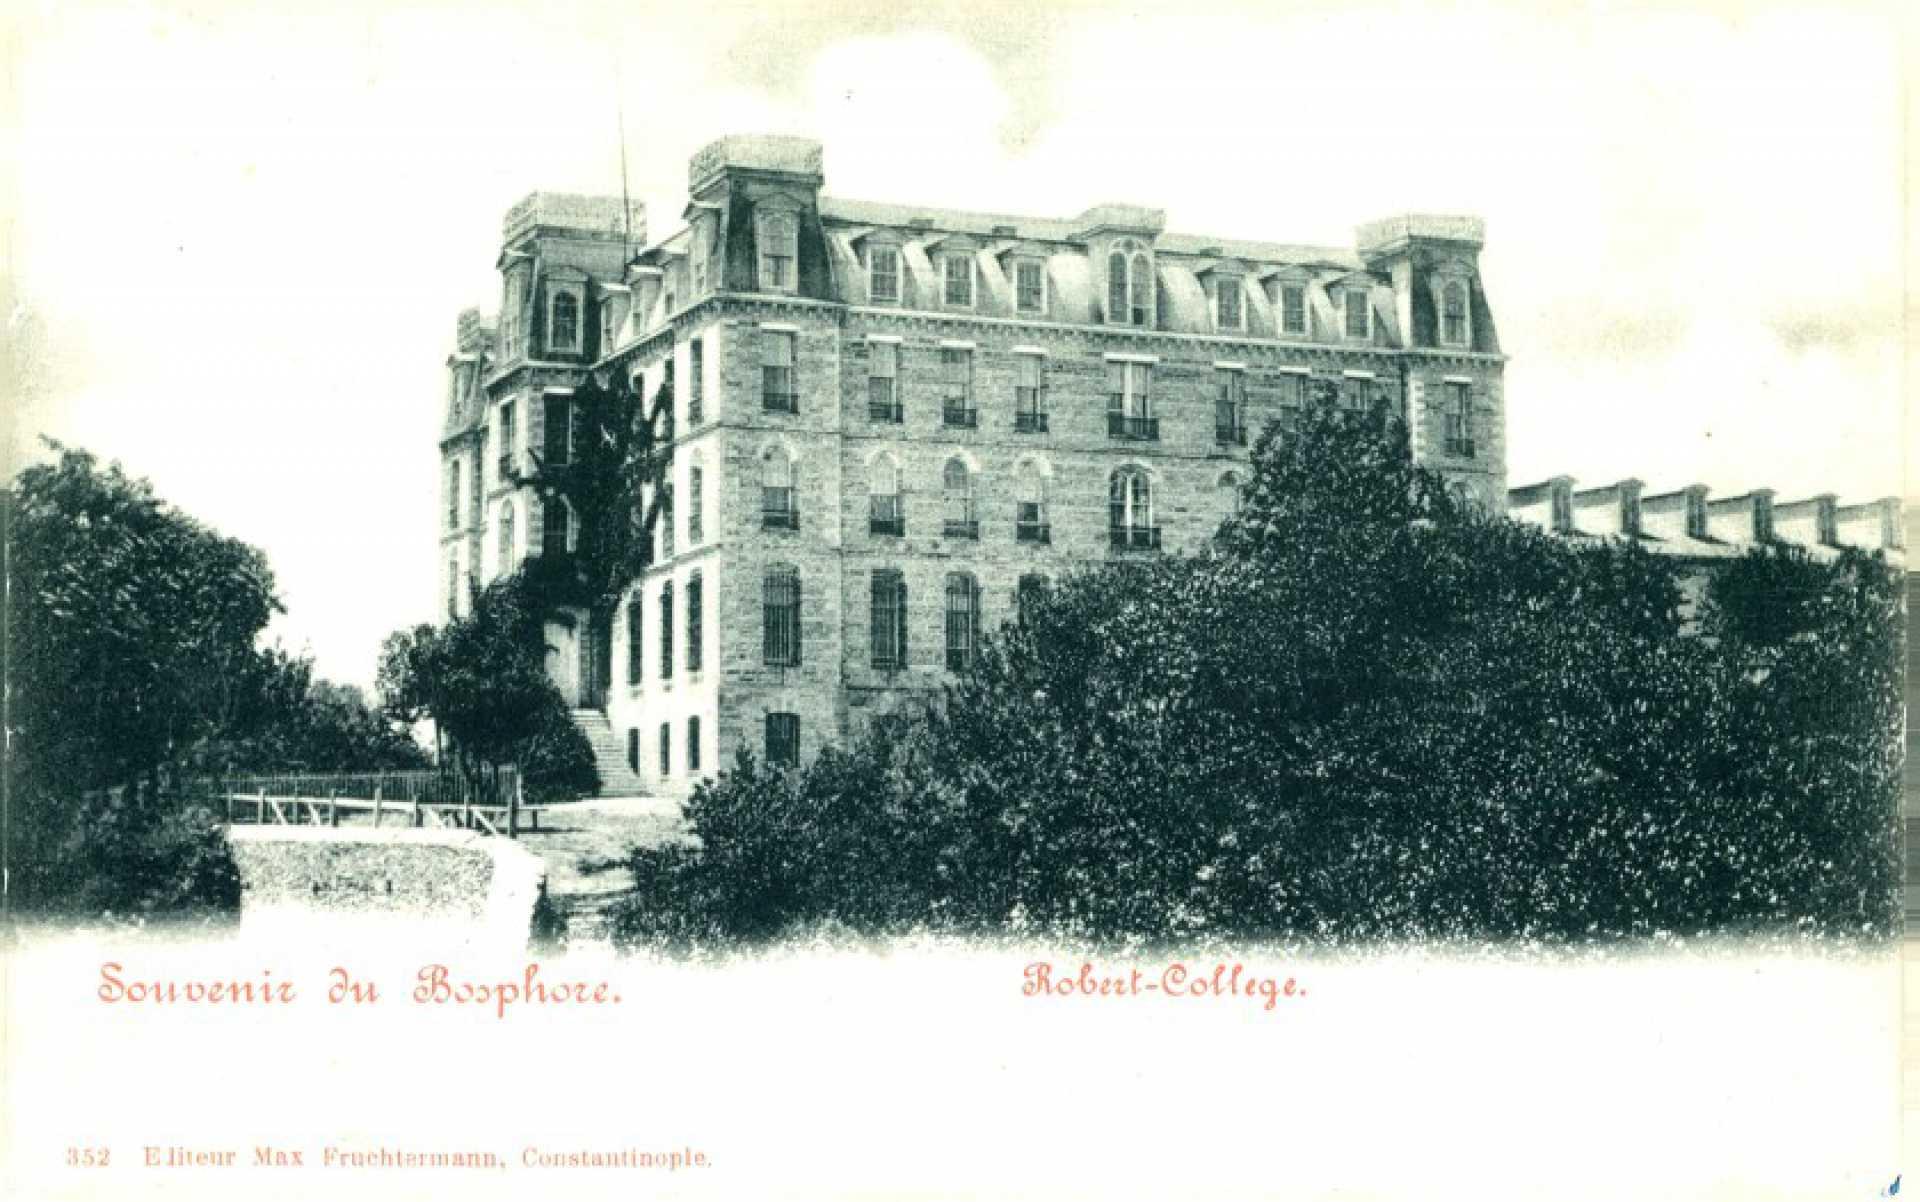 Souvenir du Boshore. Robert-College